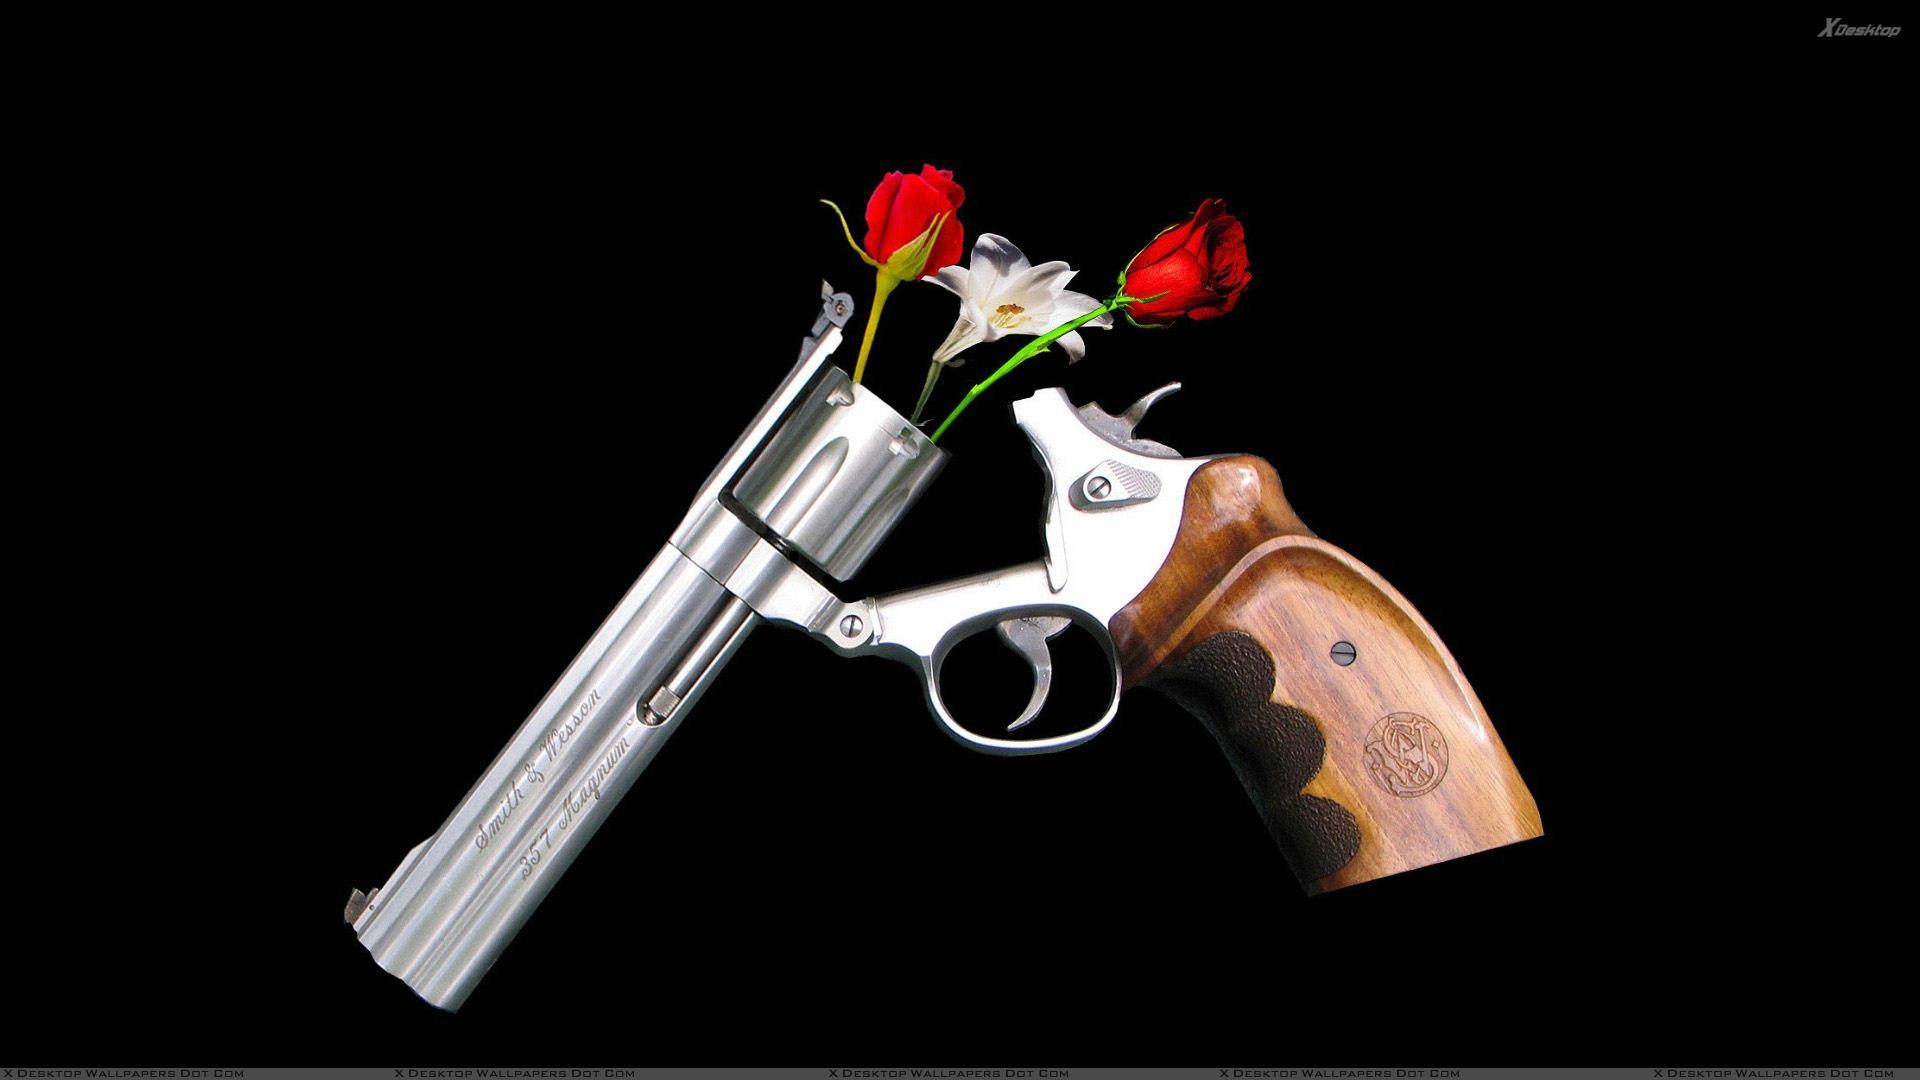 Free Download Pics Photos Guns N Roses 16123 Hd Wallpapers